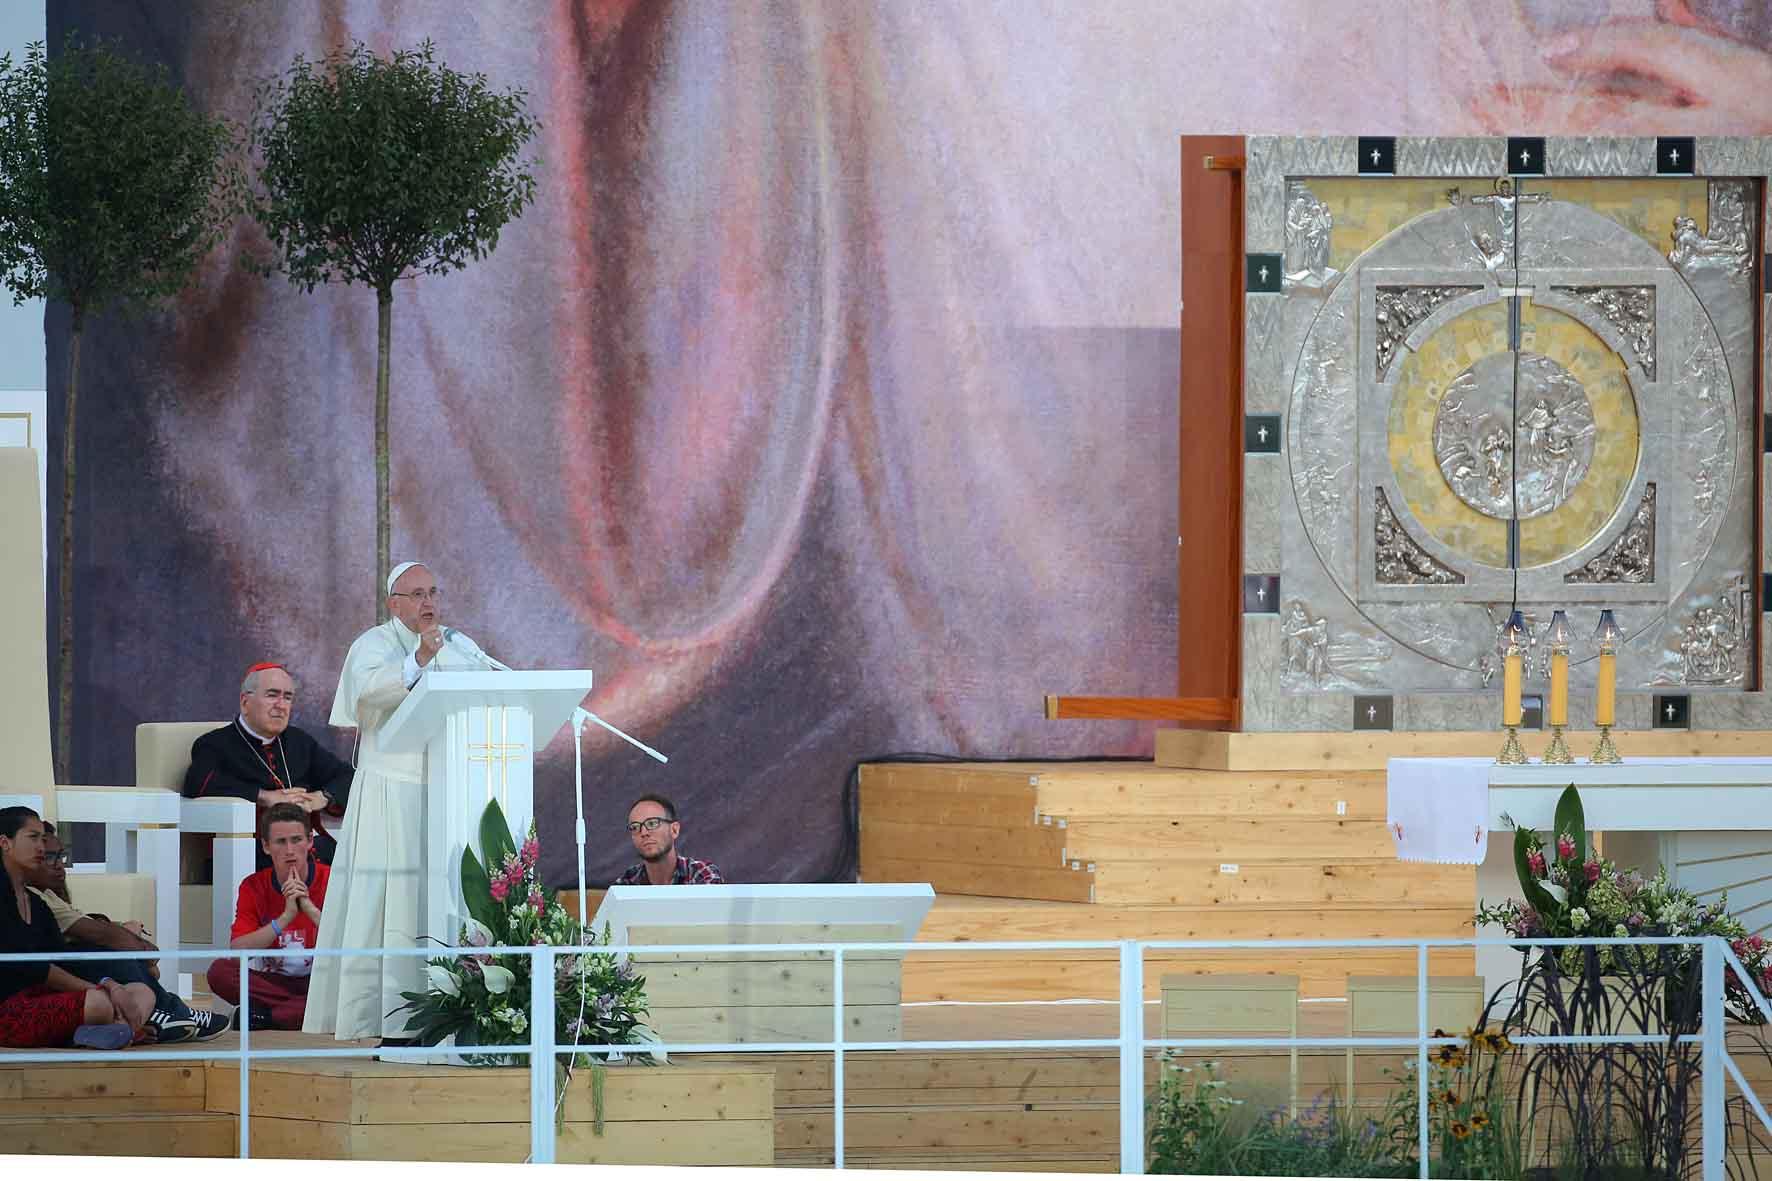 Dio aspetta te gmg 2016 italian website - Papa francesco divano ...